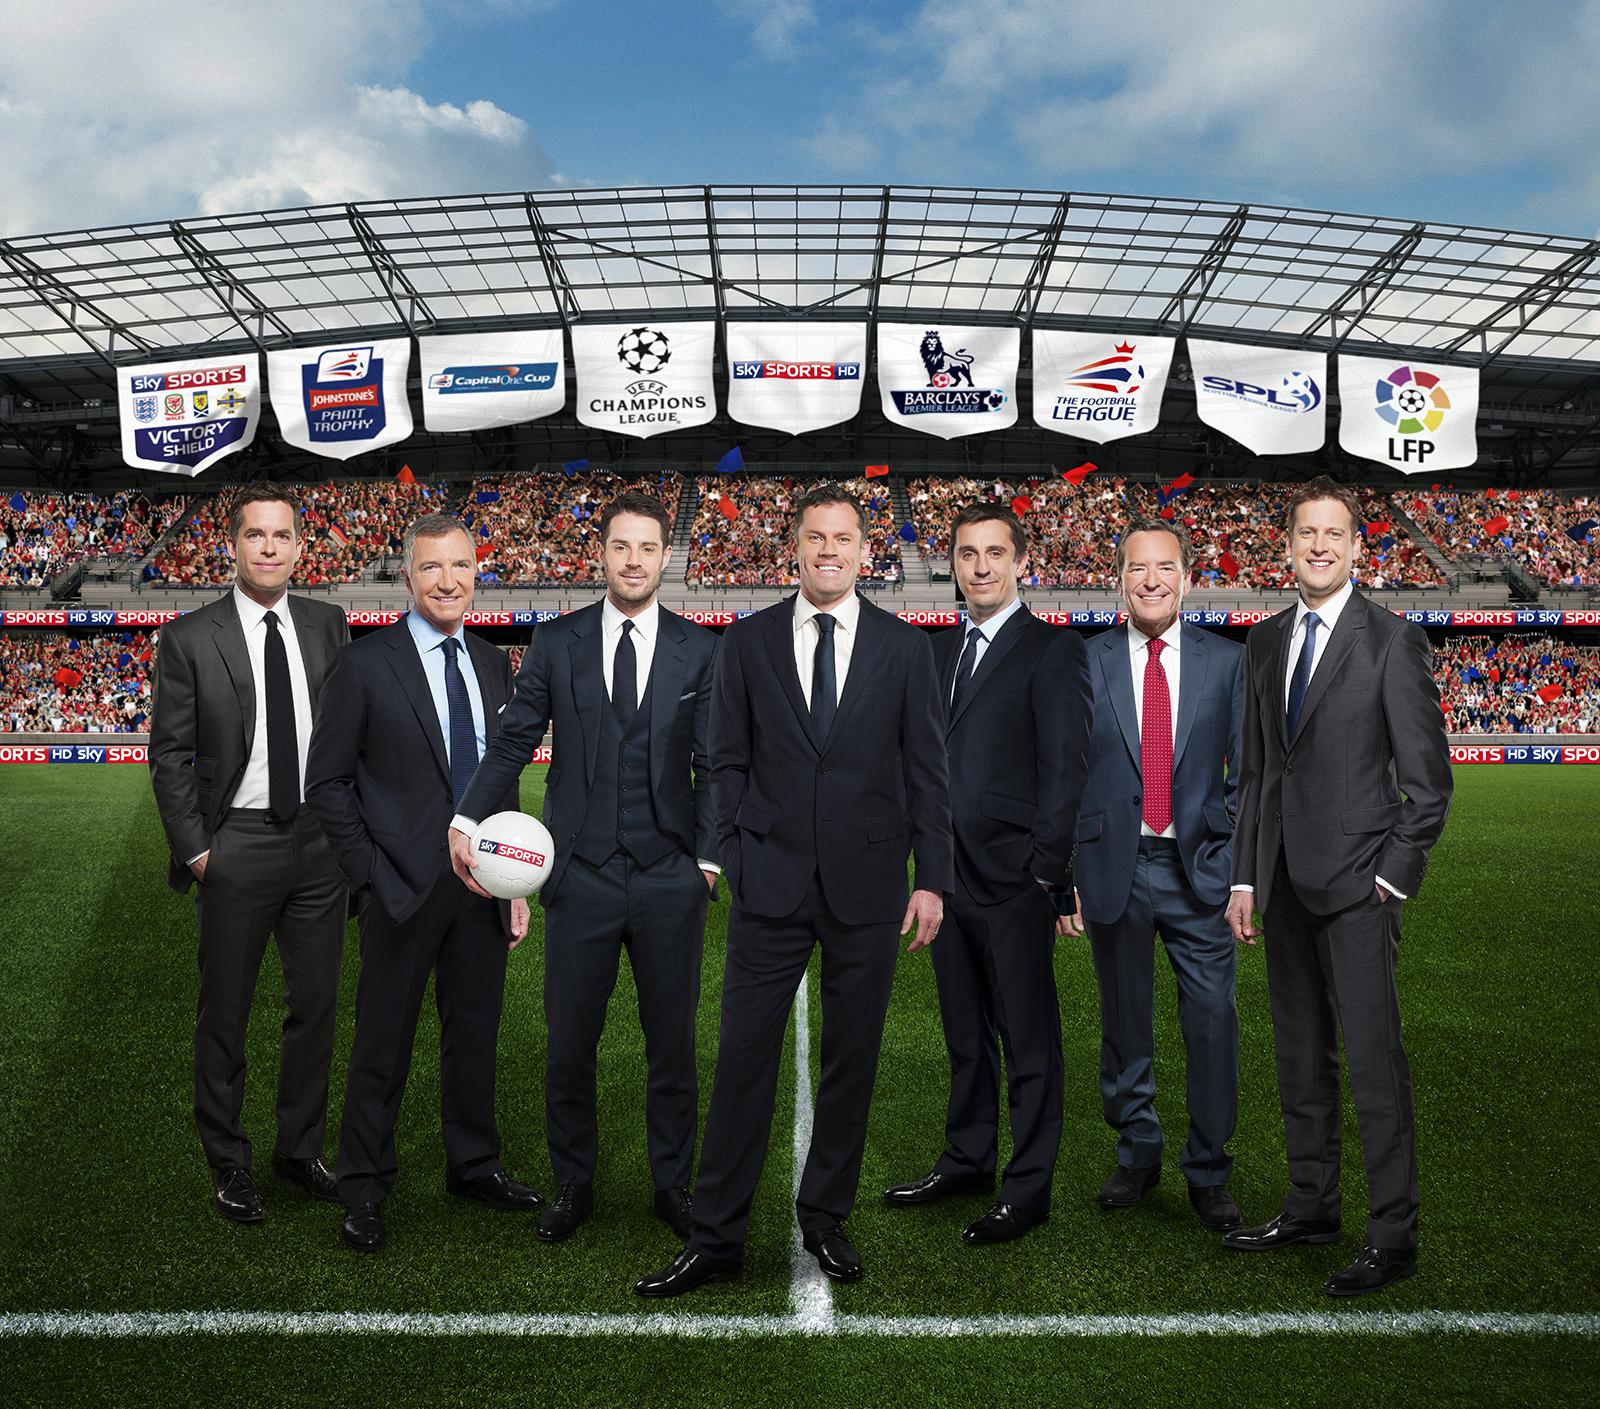 2013-07-11-Sky Sports Group-MainGroupShot2MB.jpg